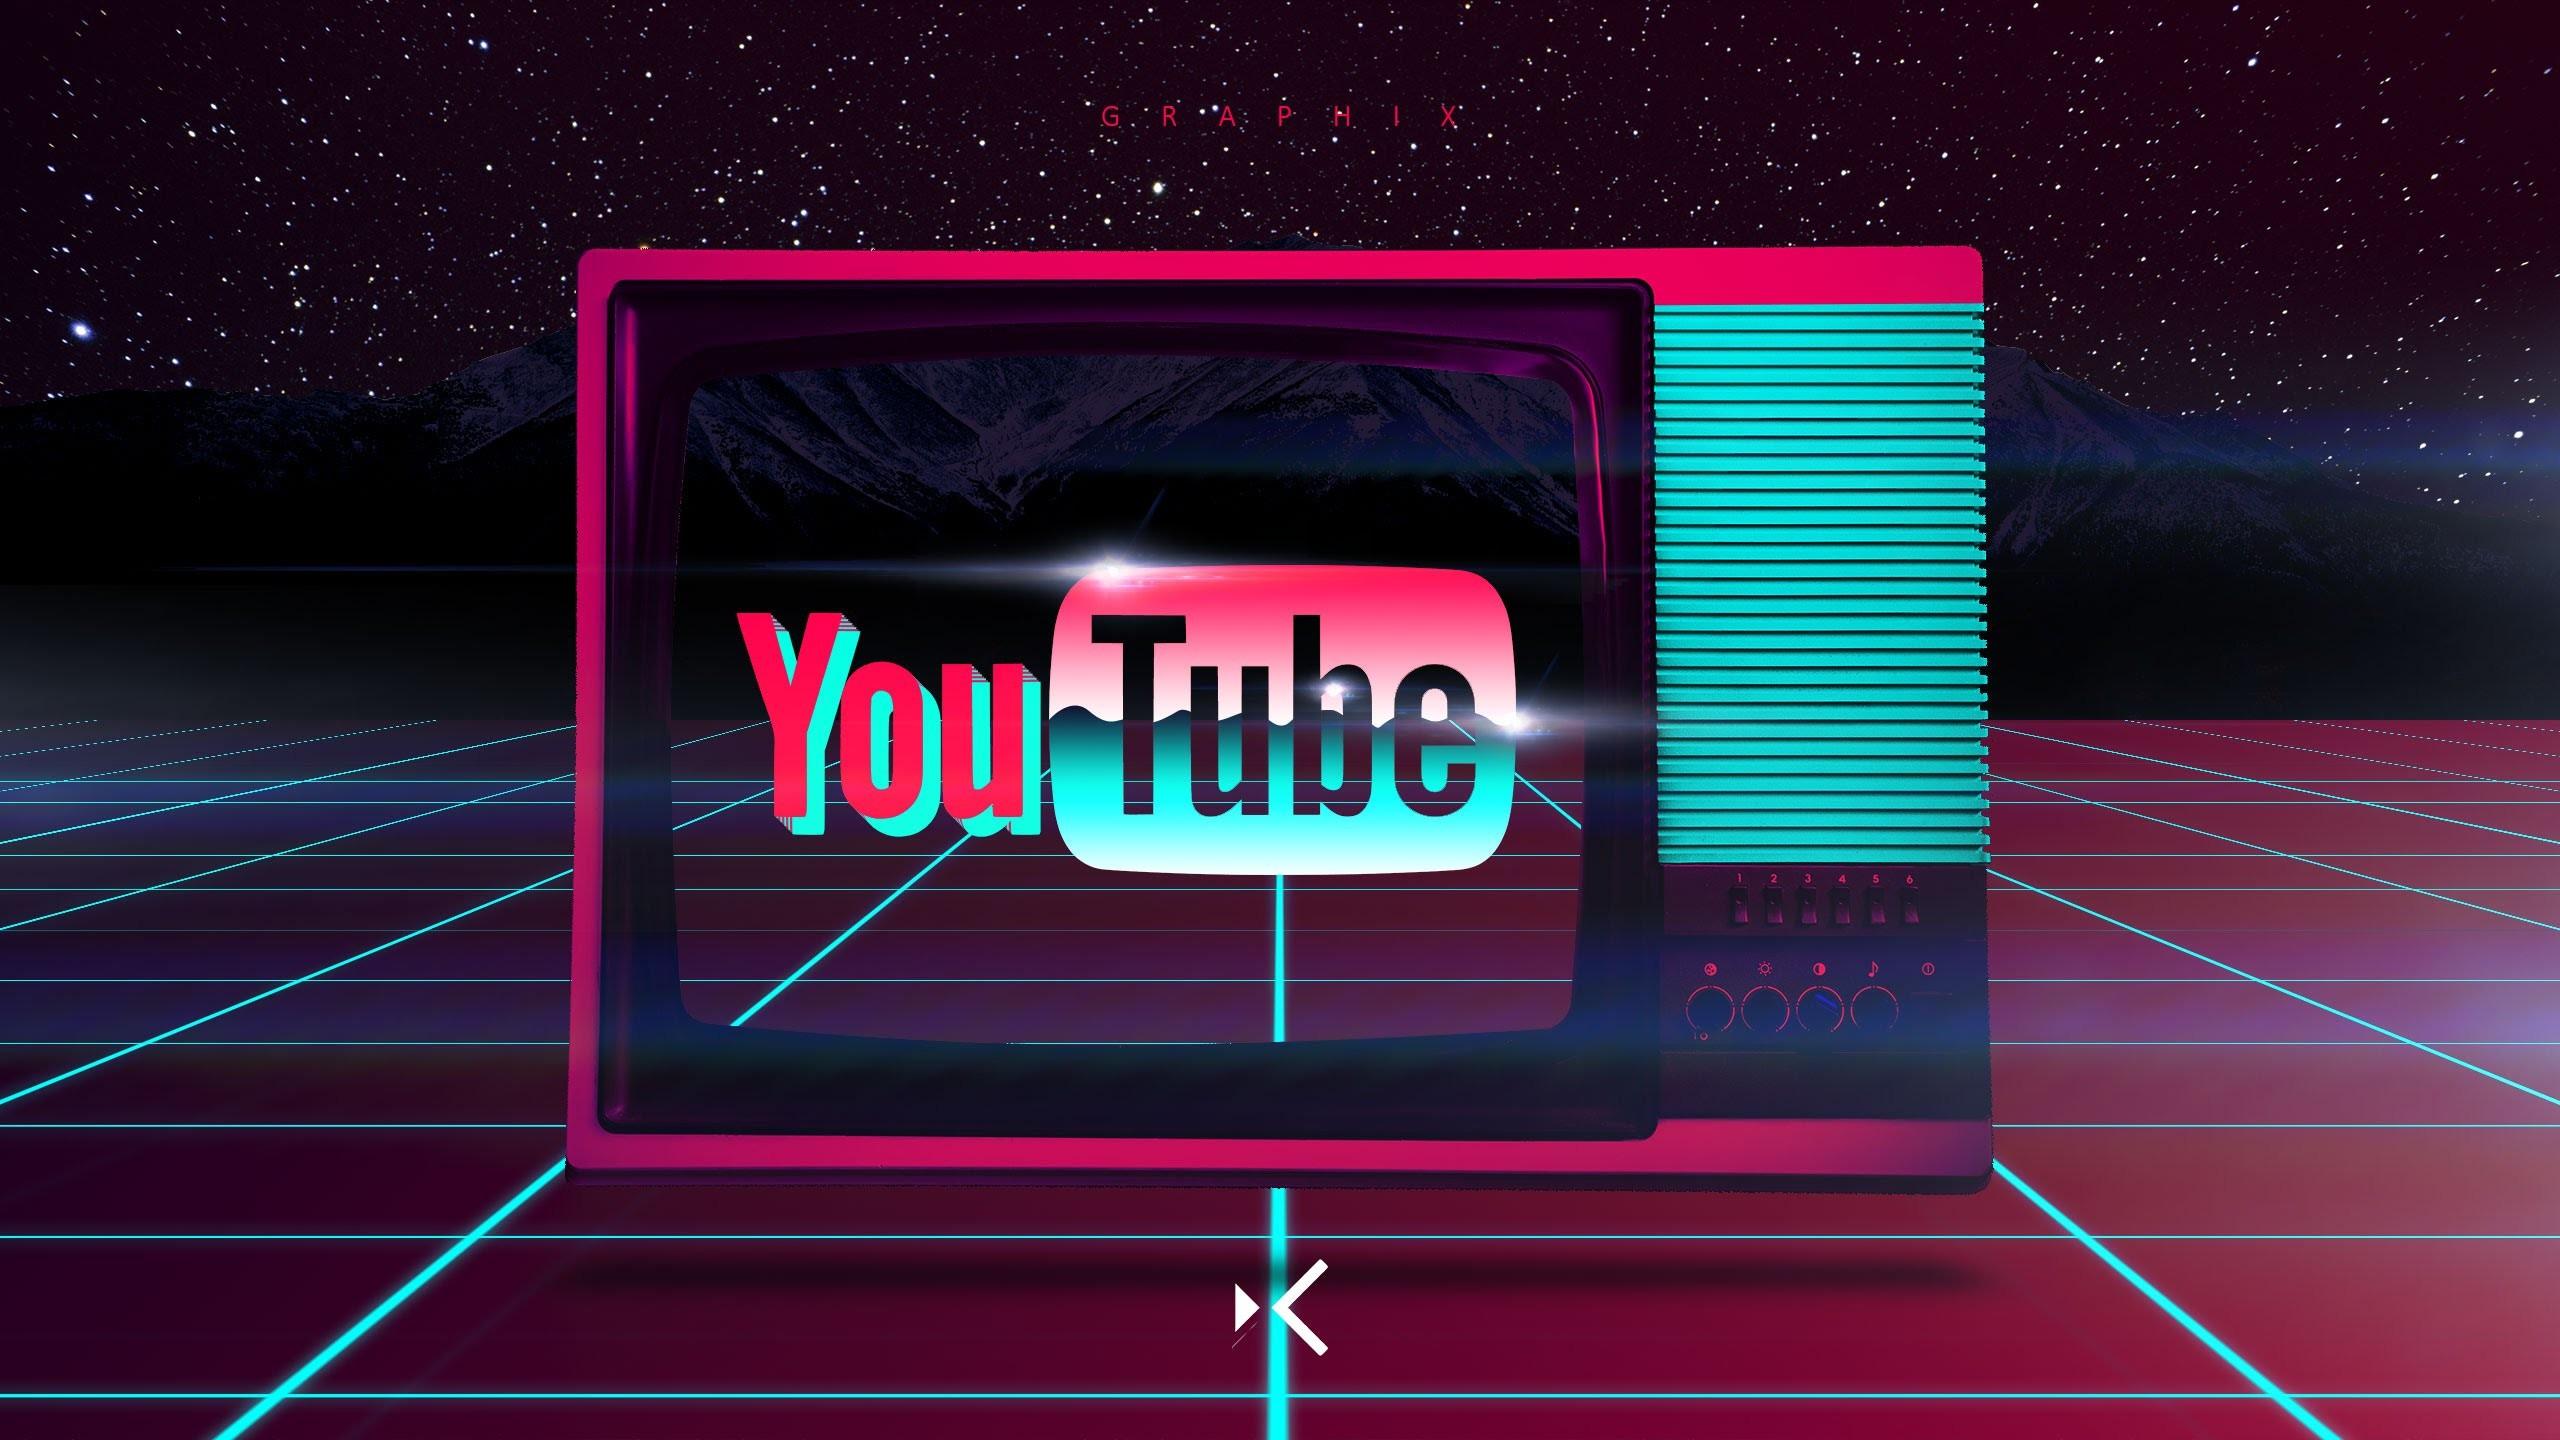 <b>YouTube</b> HD <b>desktop wallpaper</